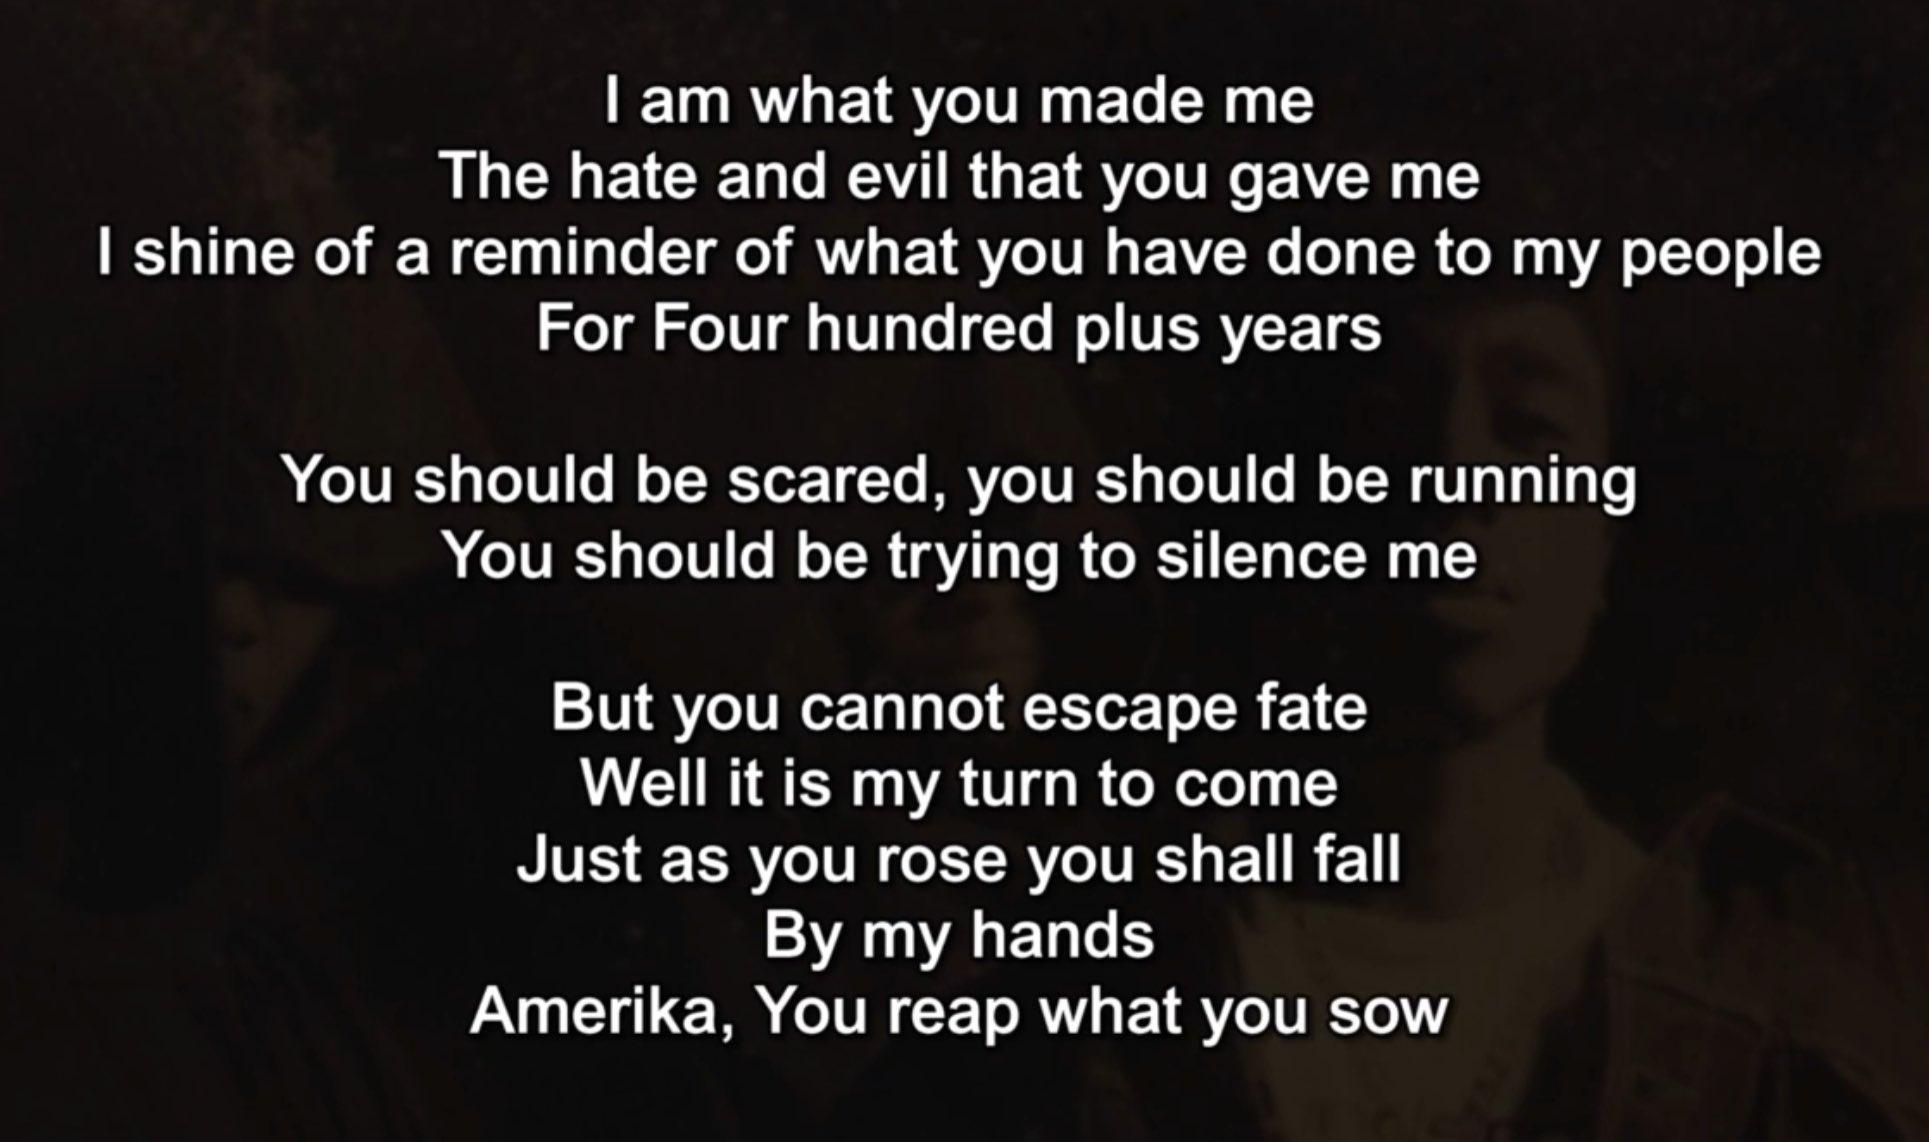 Tupac | Words of Wisdom: https://t.co/Mjfm1kfDuW